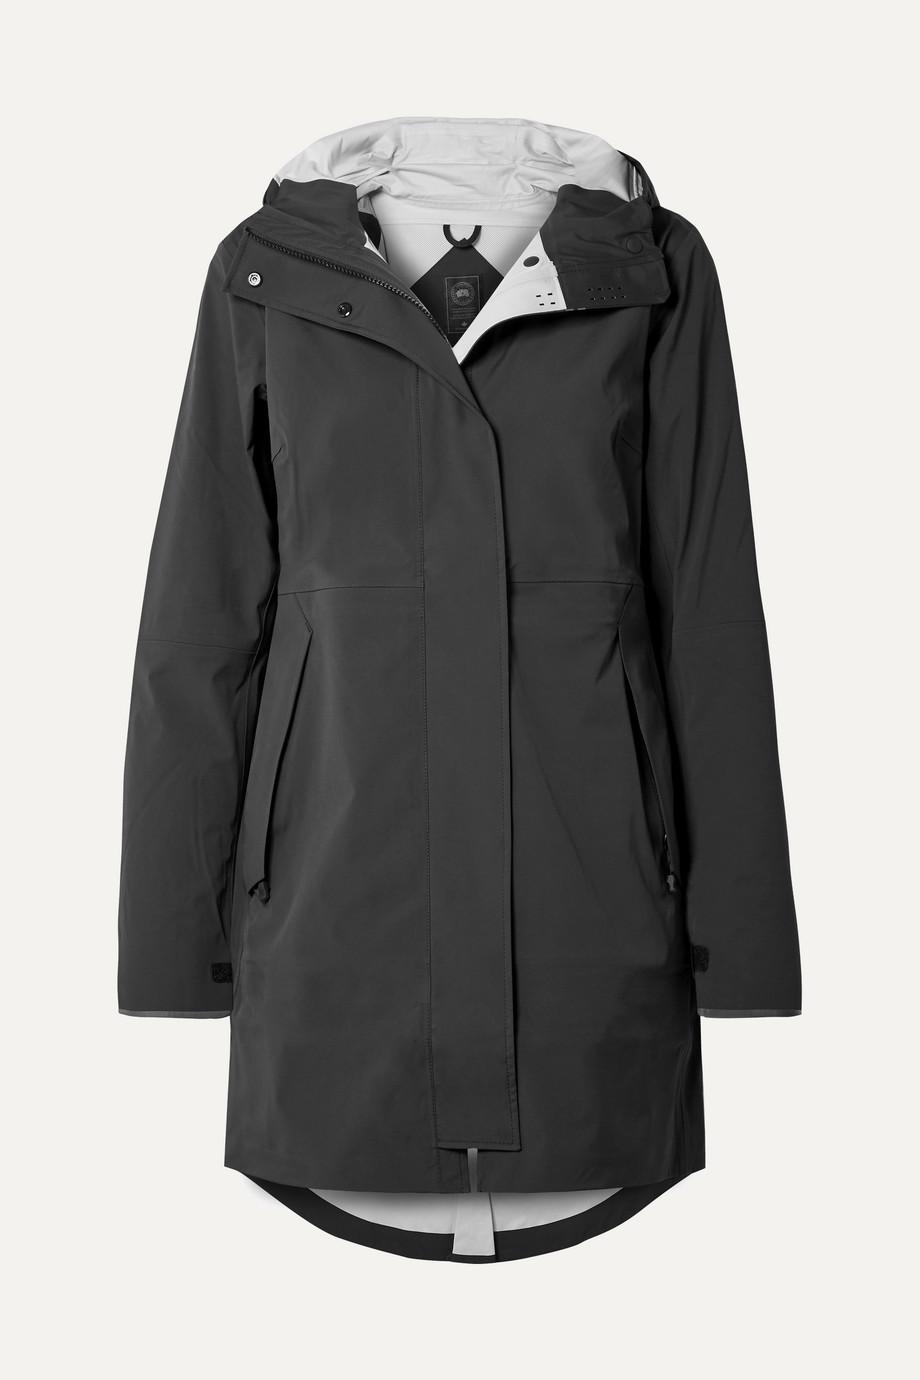 Canada Goose Salida hooded shell jacket